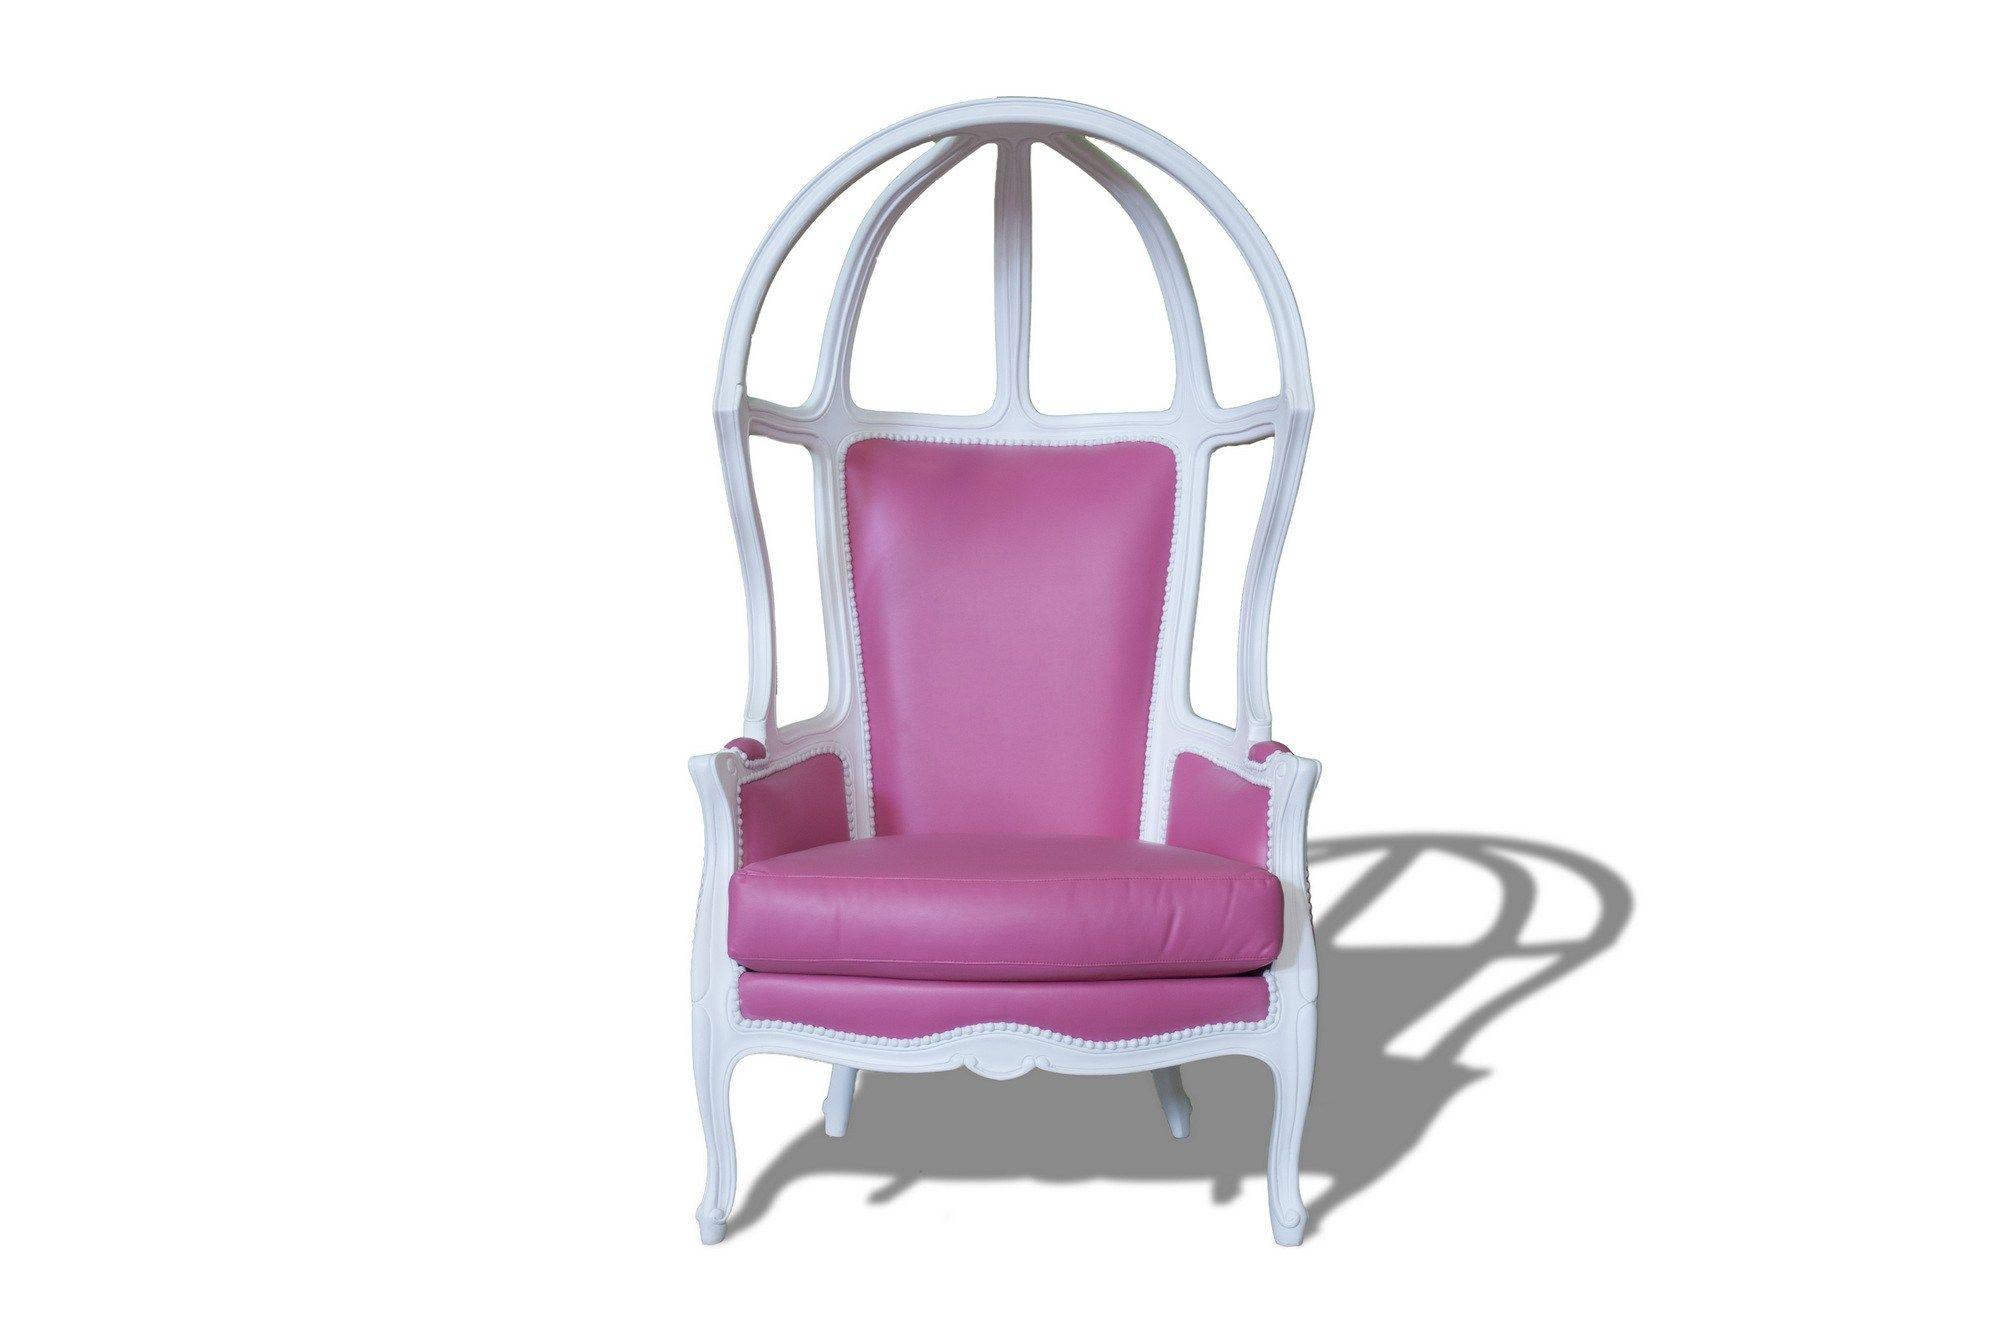 Dome Chair by POLaRT at Gilt | Мебель, Мебель своими руками